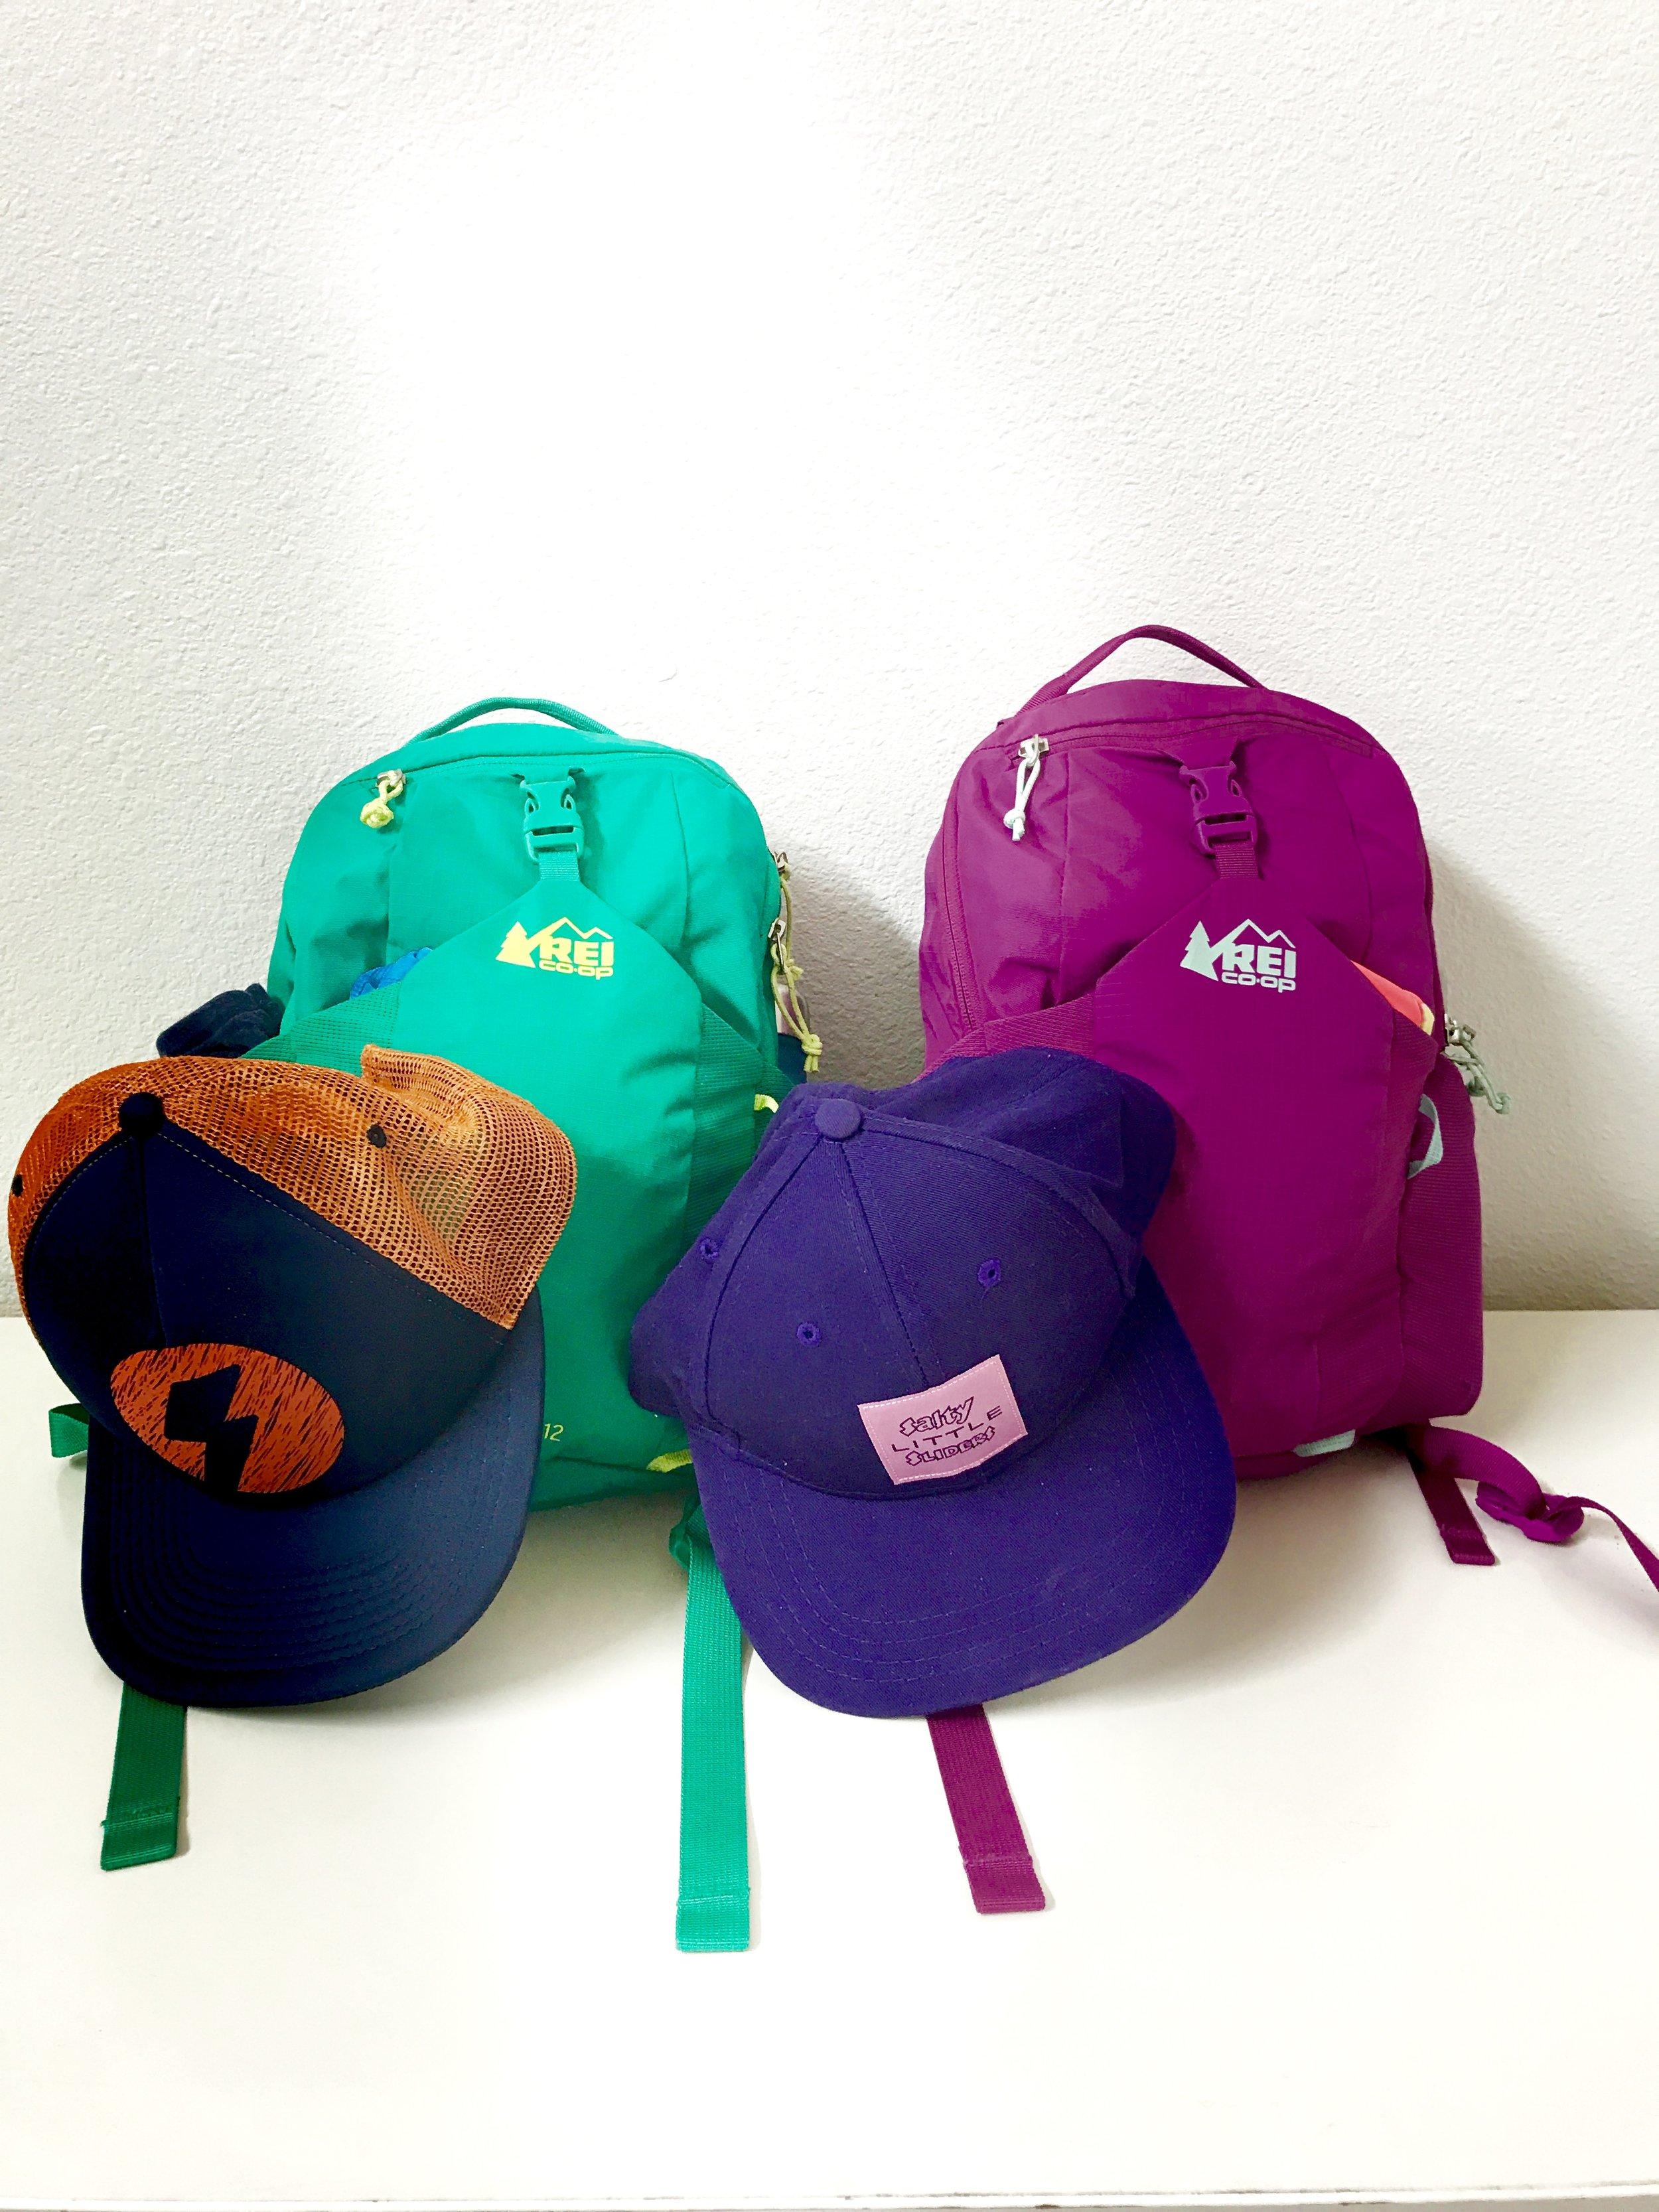 REI Tarn12 backpacks and Salty LIttle Sliders Hat